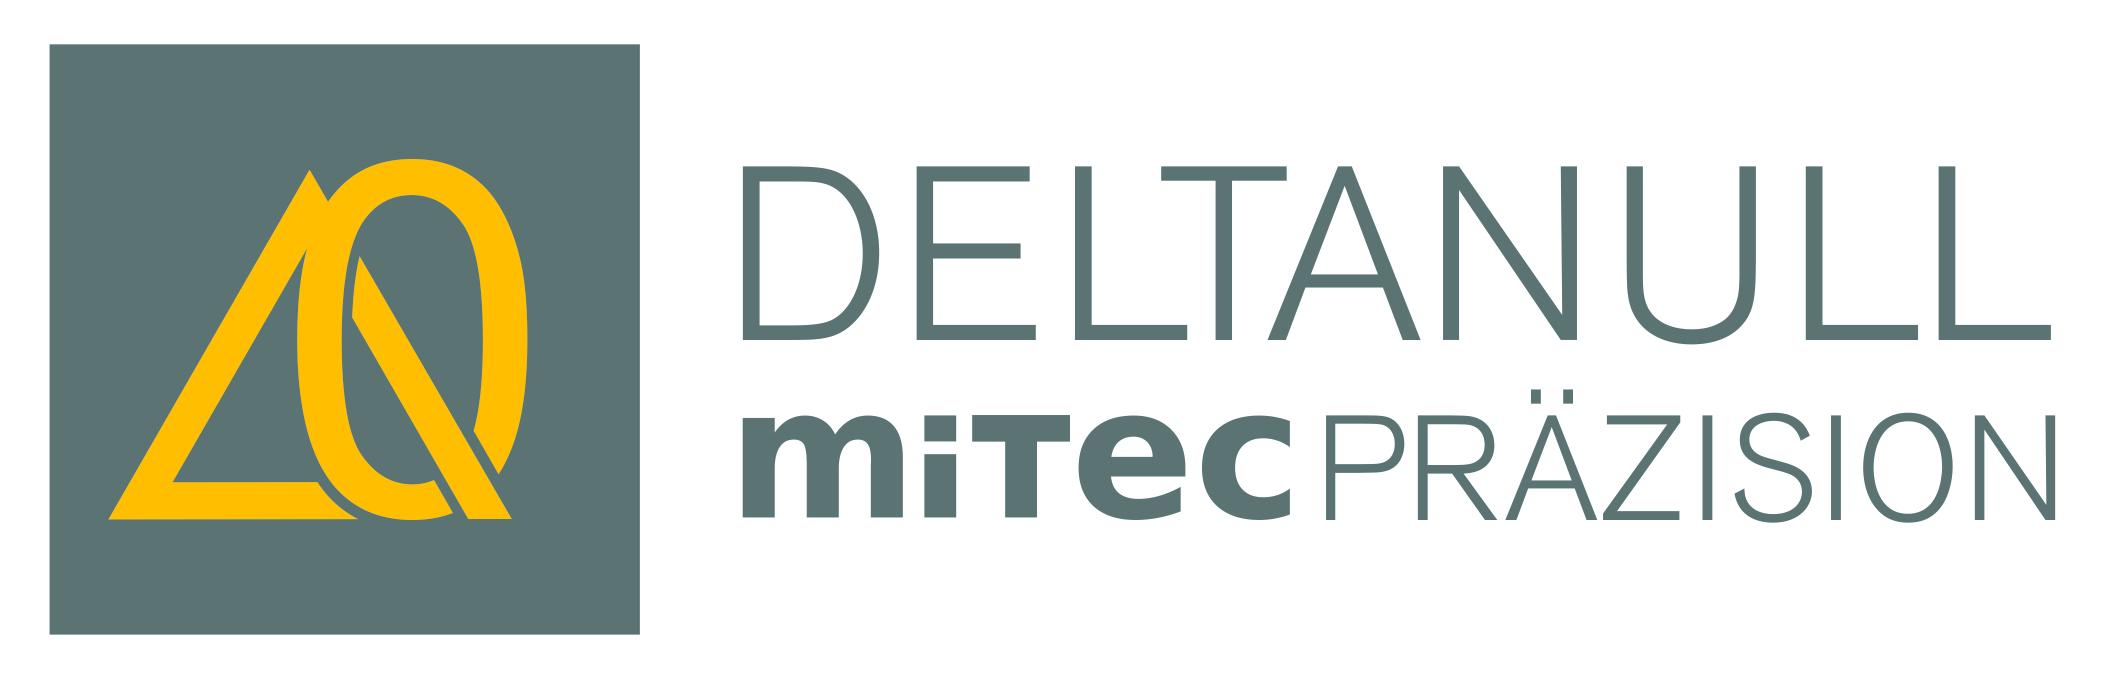 miTec Microtechnologie GmbH